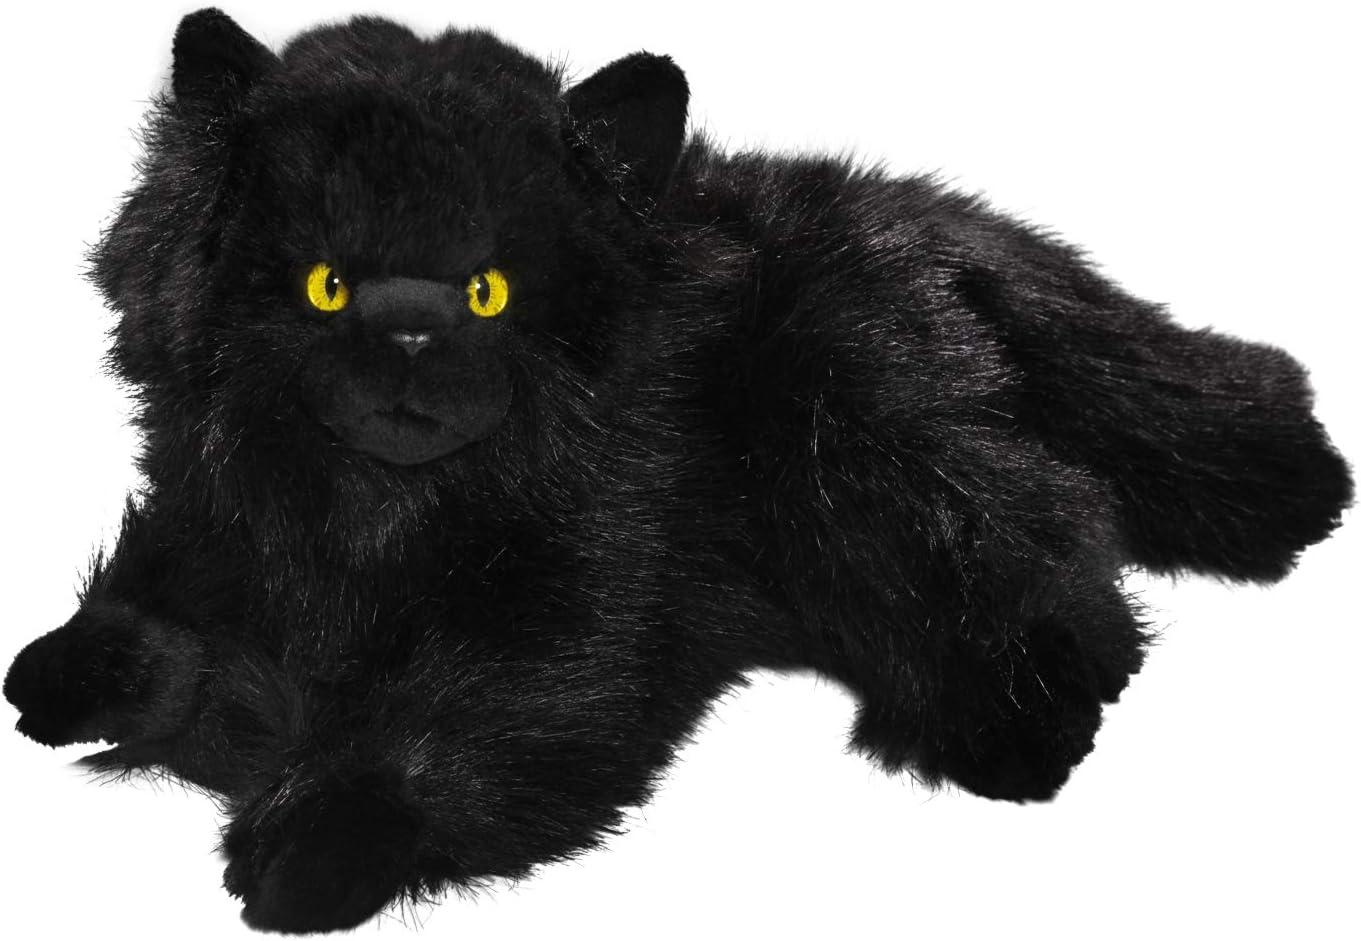 Carl Dick Peluche - Gato Persa Negro (Felpa, 30cm) [Juguete] 3474